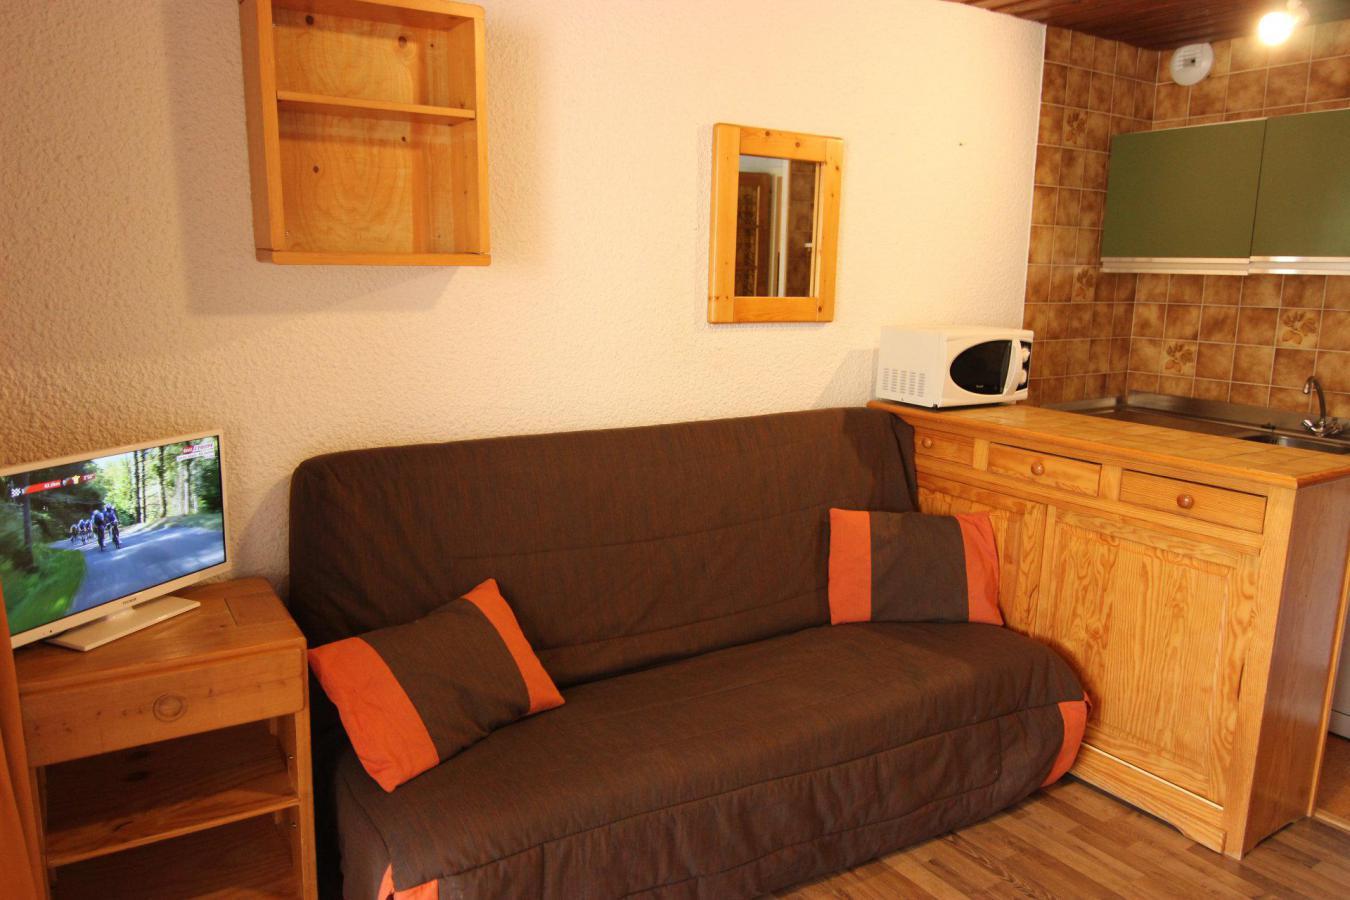 Location au ski Studio 3 personnes (S2) - Residence Le Serac - Val Thorens - Kitchenette